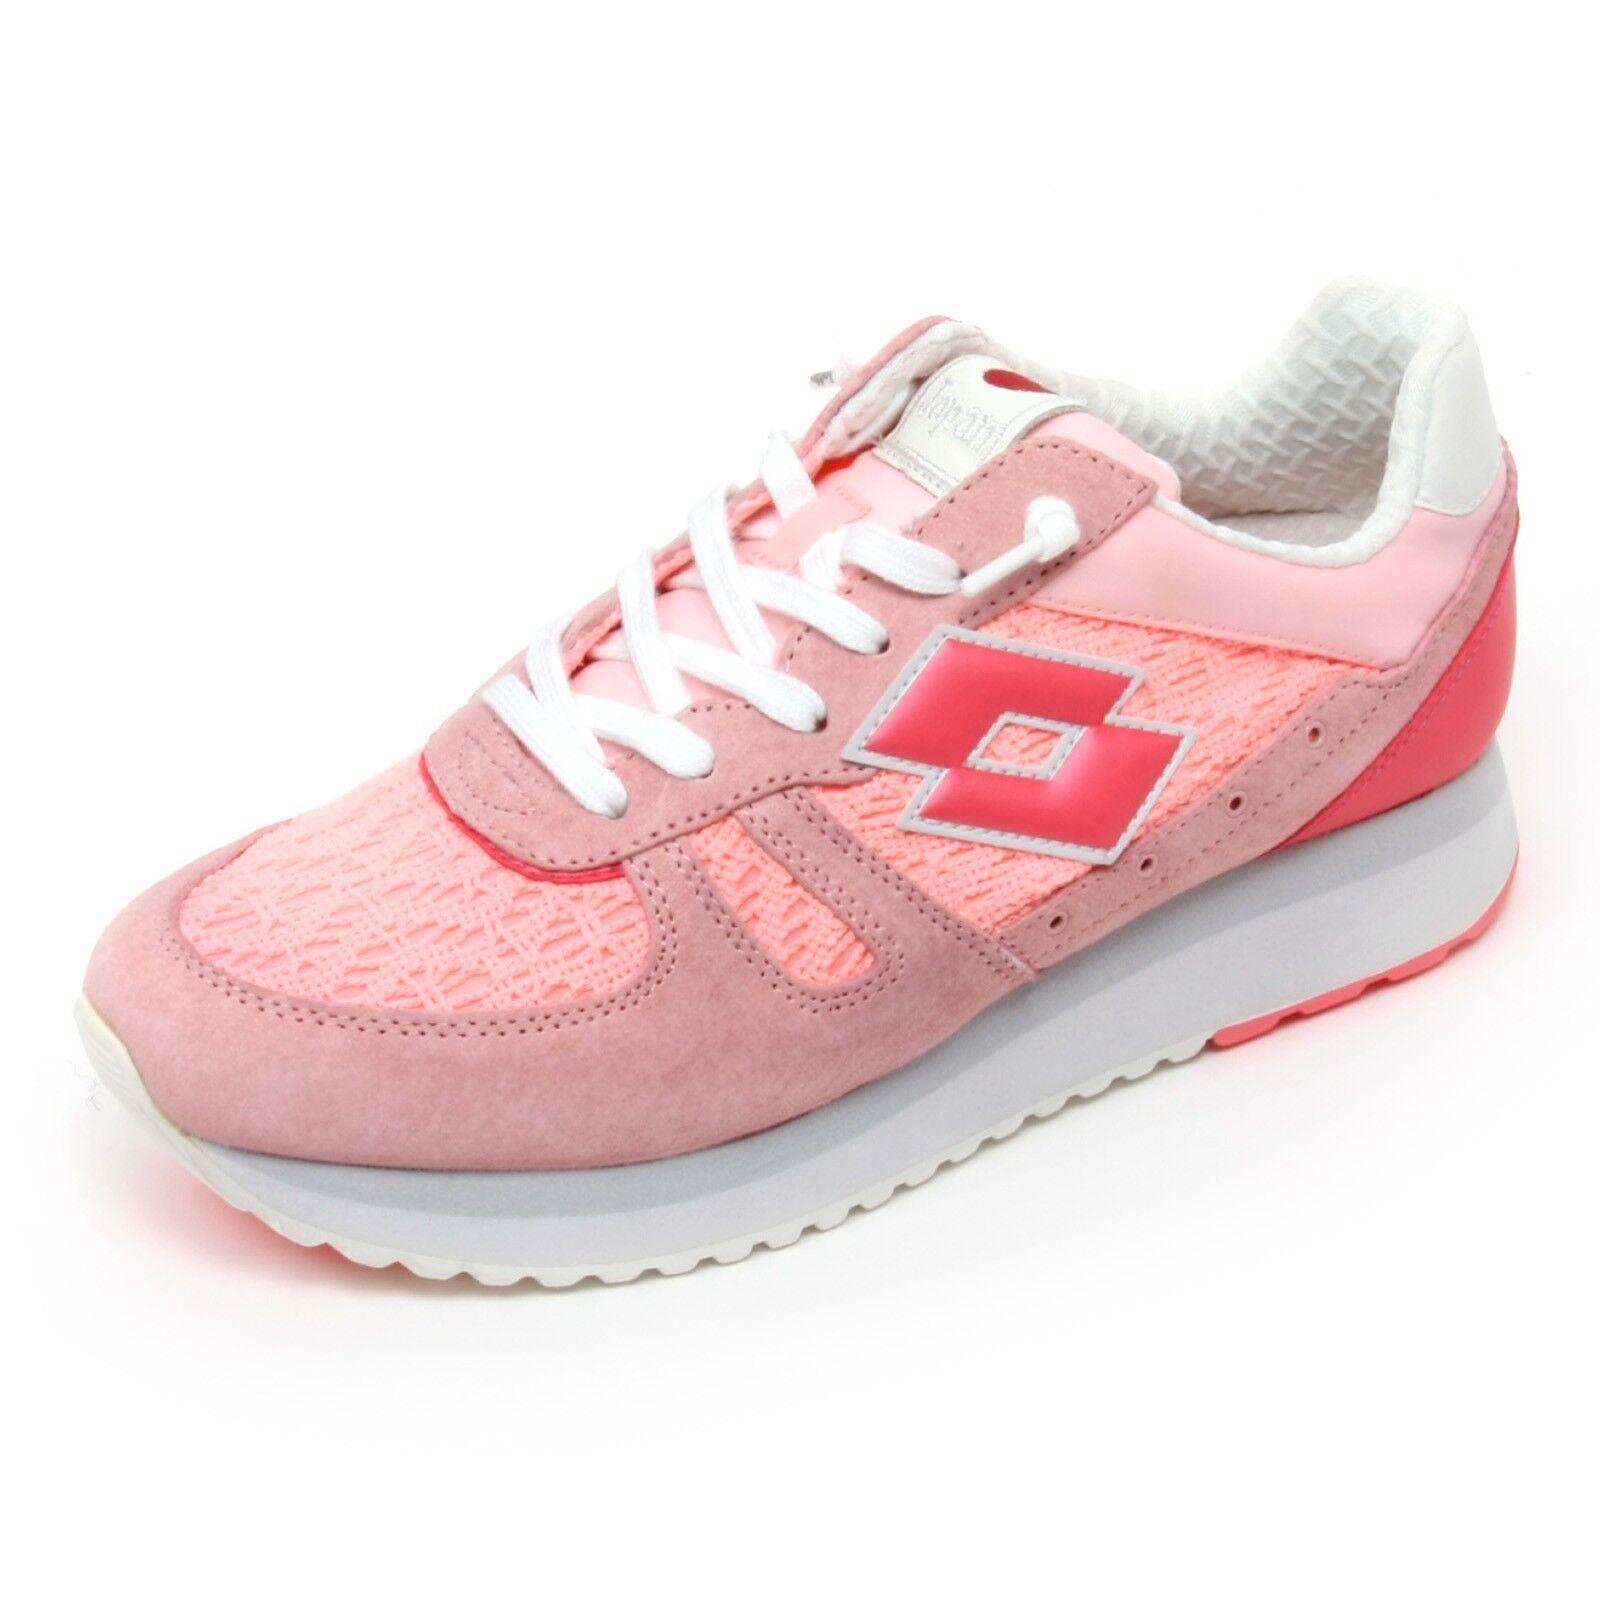 B6734 sneaker donna LOTTO LEGGENDA TOKYO WEDGE scarpa rosa shoe woman